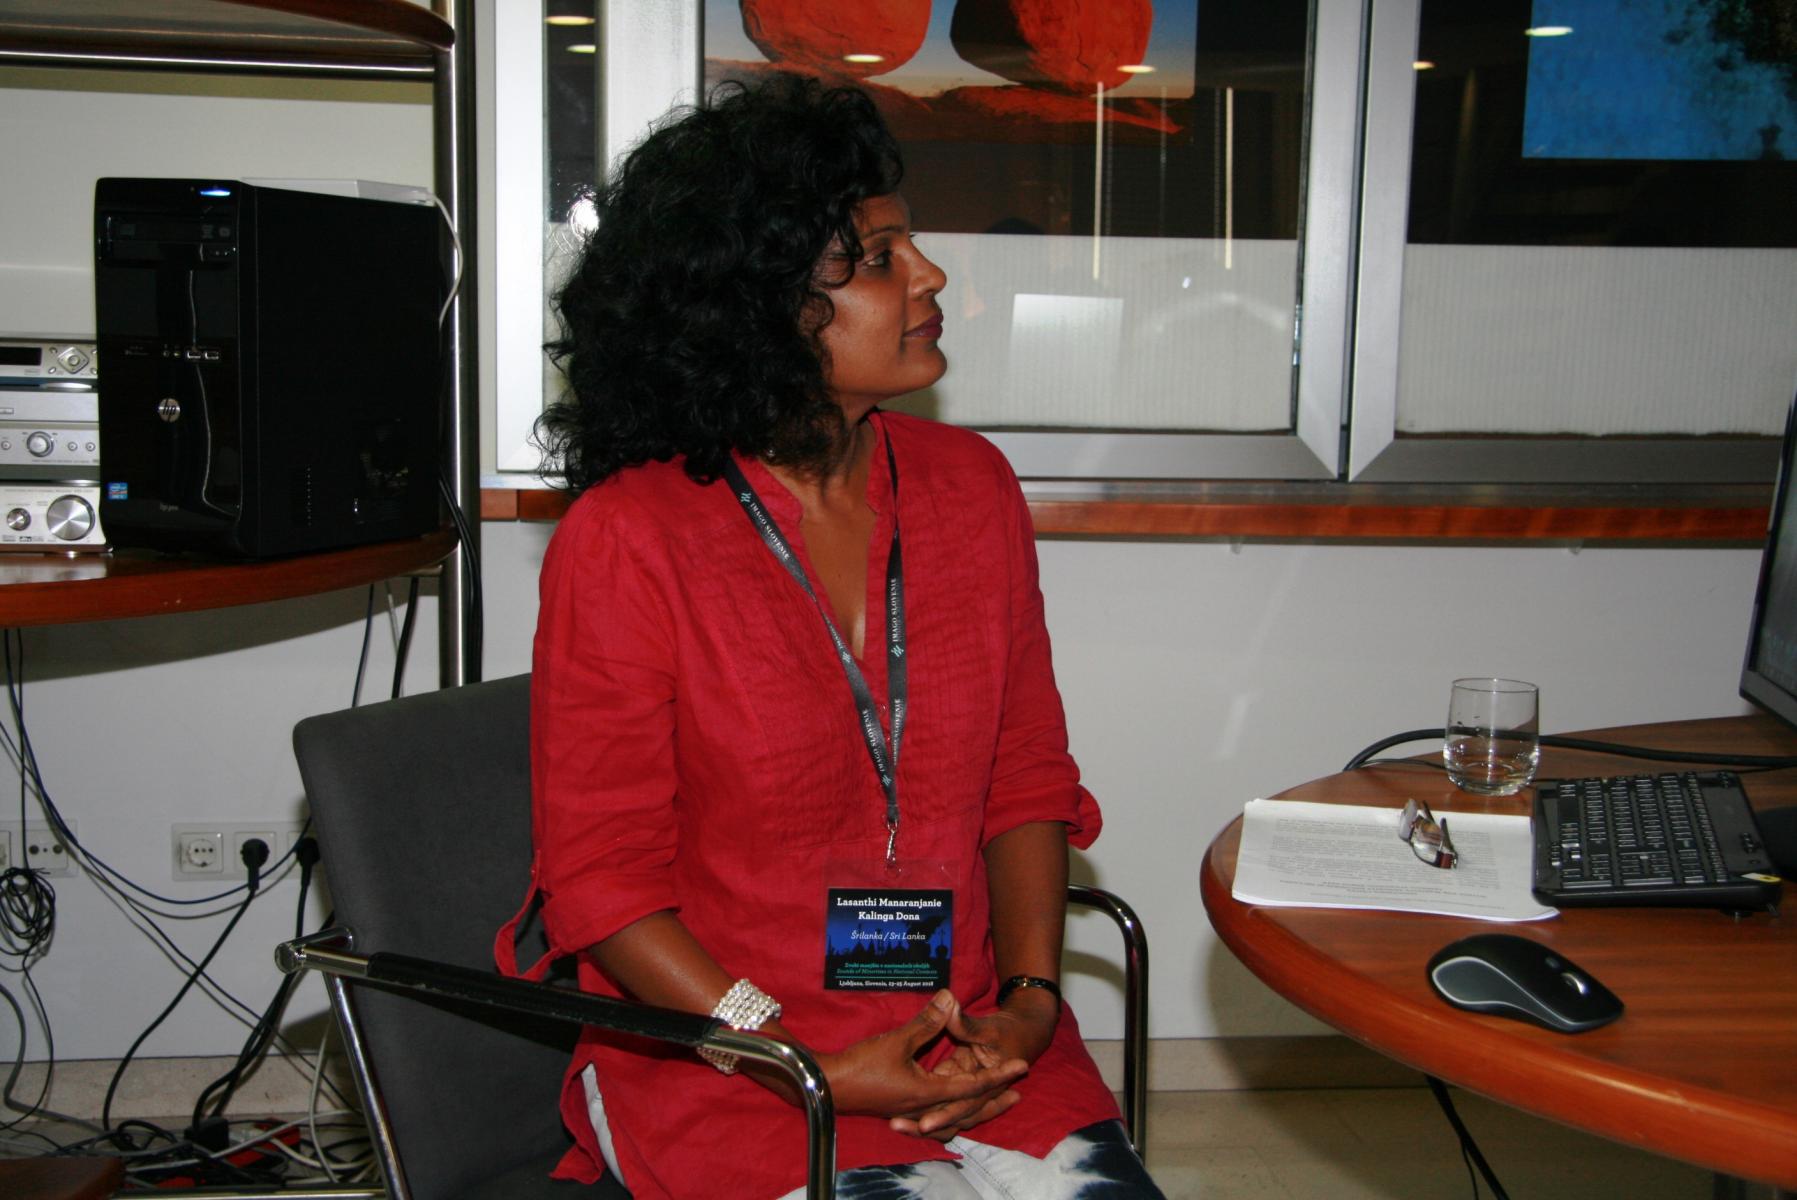 Lasanthi Manaranjanie Kalinga Dona, nacionalna predstavnica Sri Lanke pri Mednarodnem združenju za tradicijsko glasbo (ICTM). Udeleženka sekcije Glasovi staroselcev. Foto: Urša Šivic.